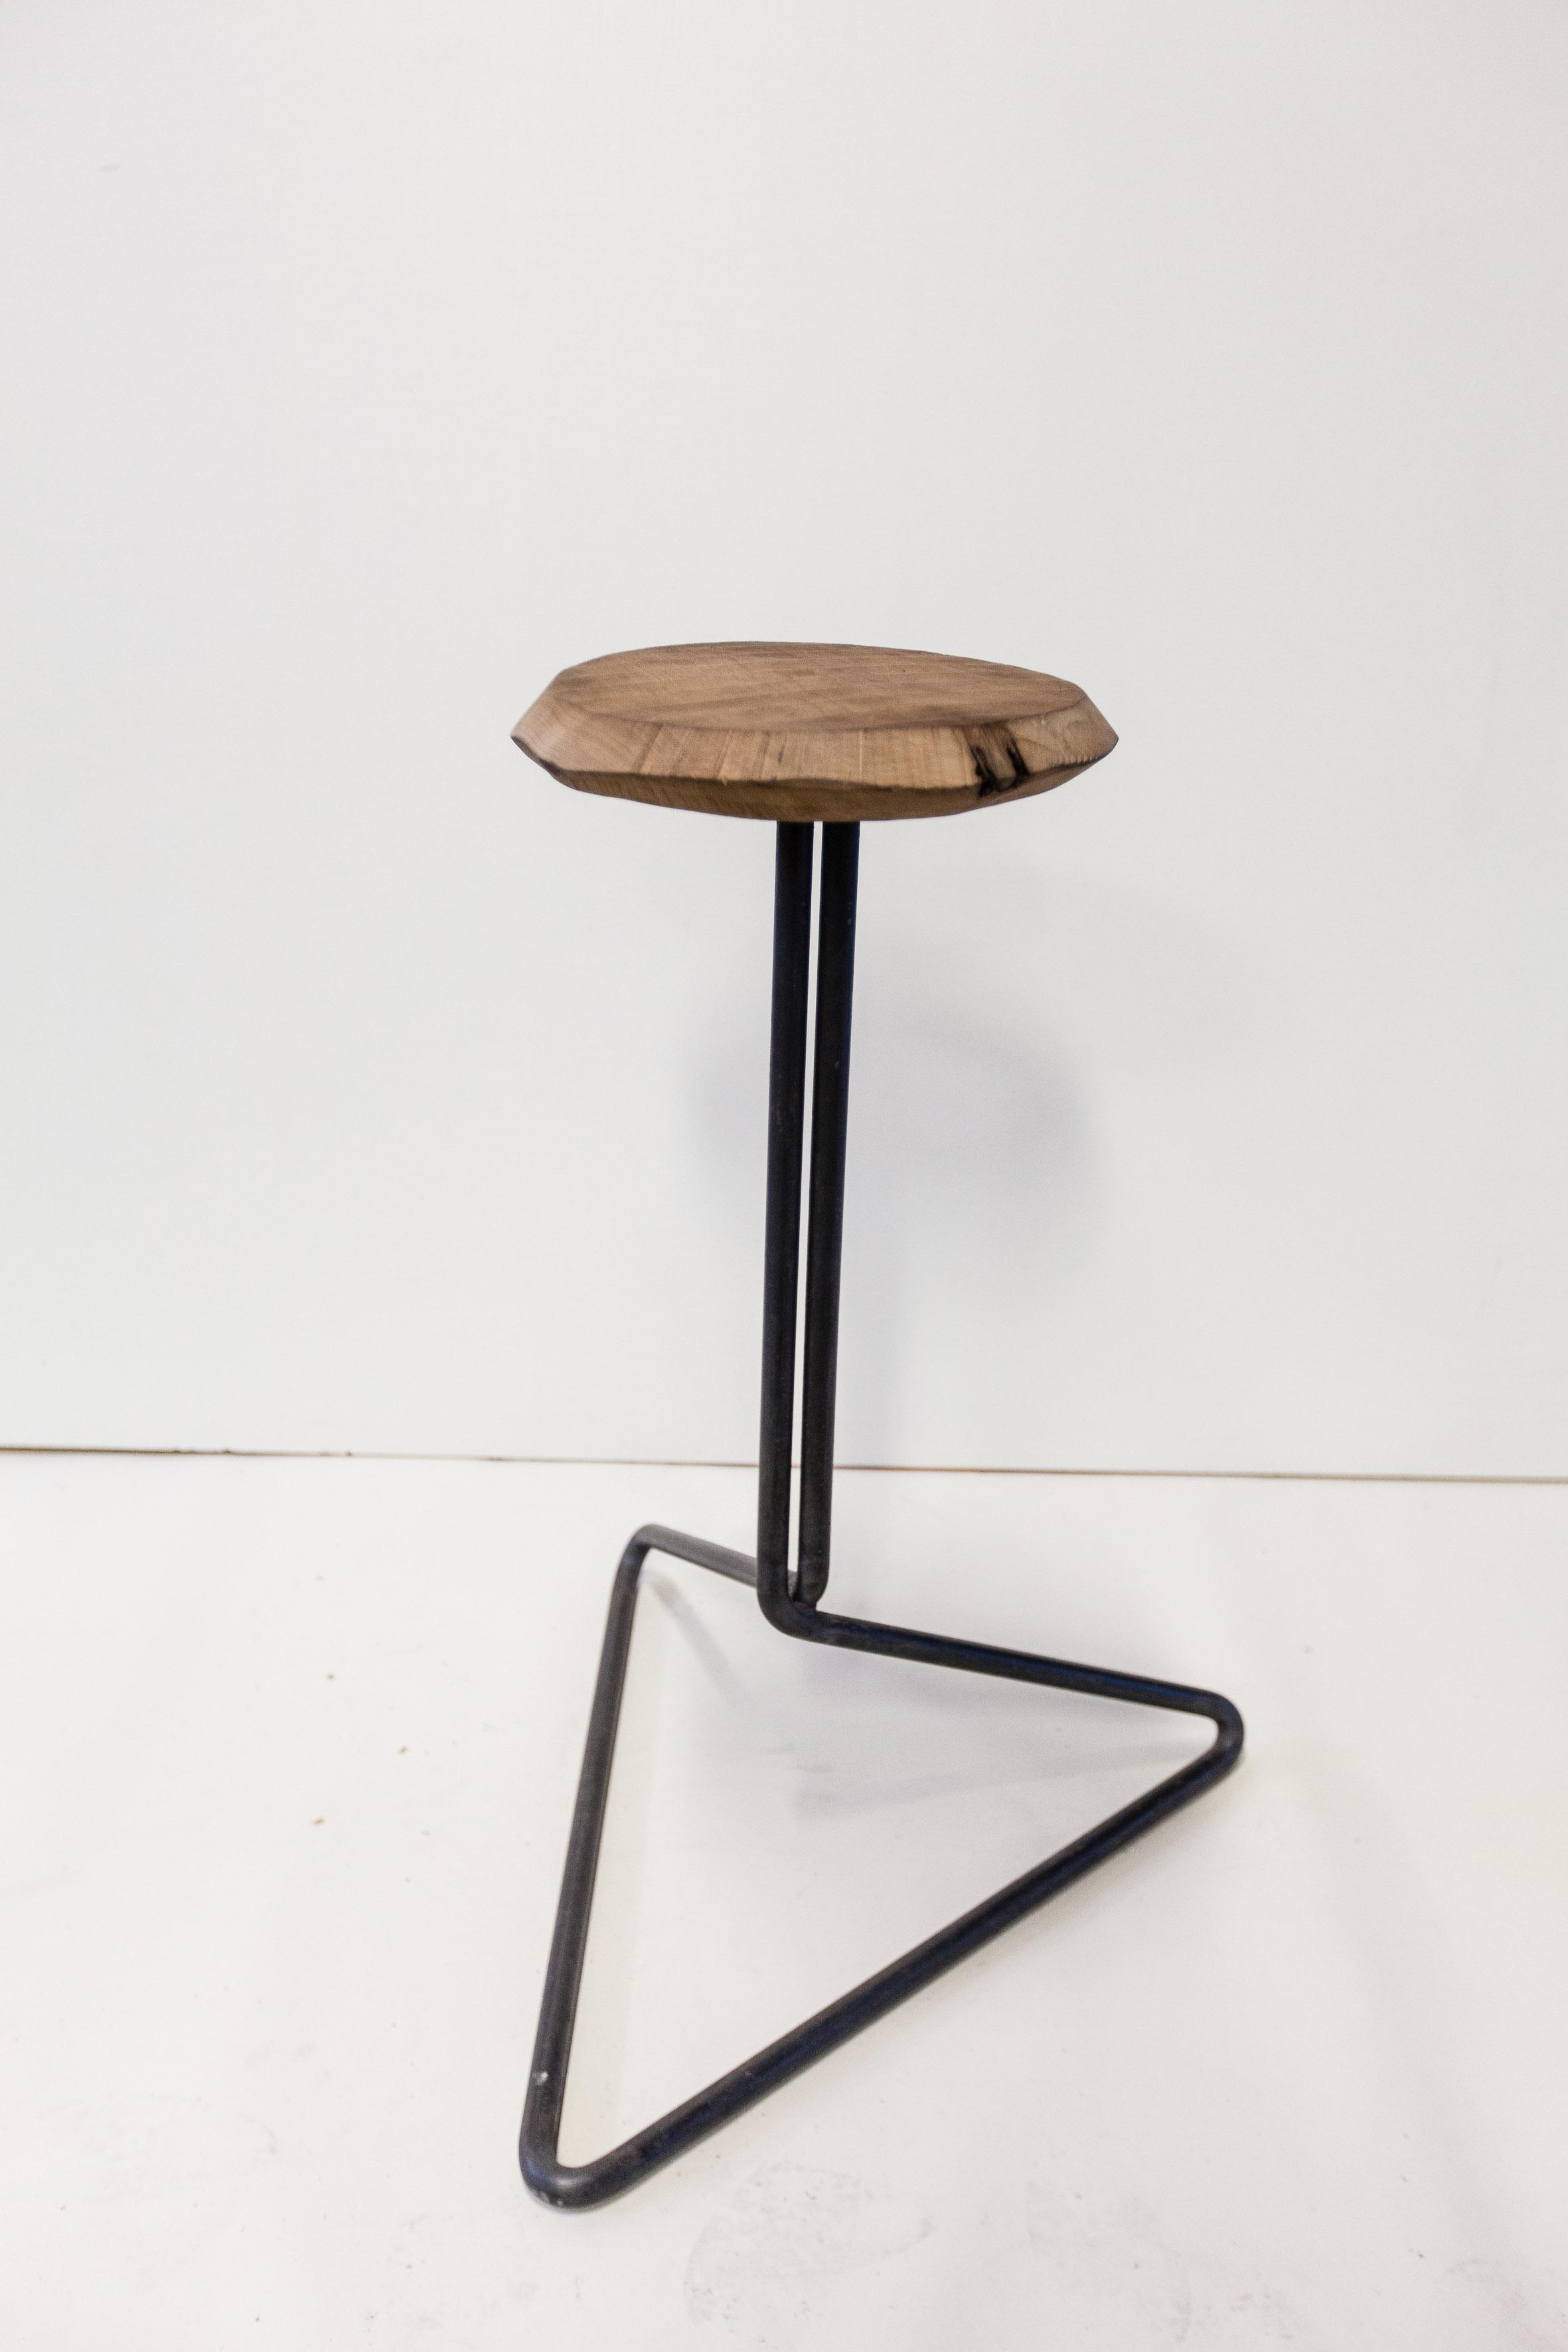 Paperclip Stool  by Michiel Poelmann